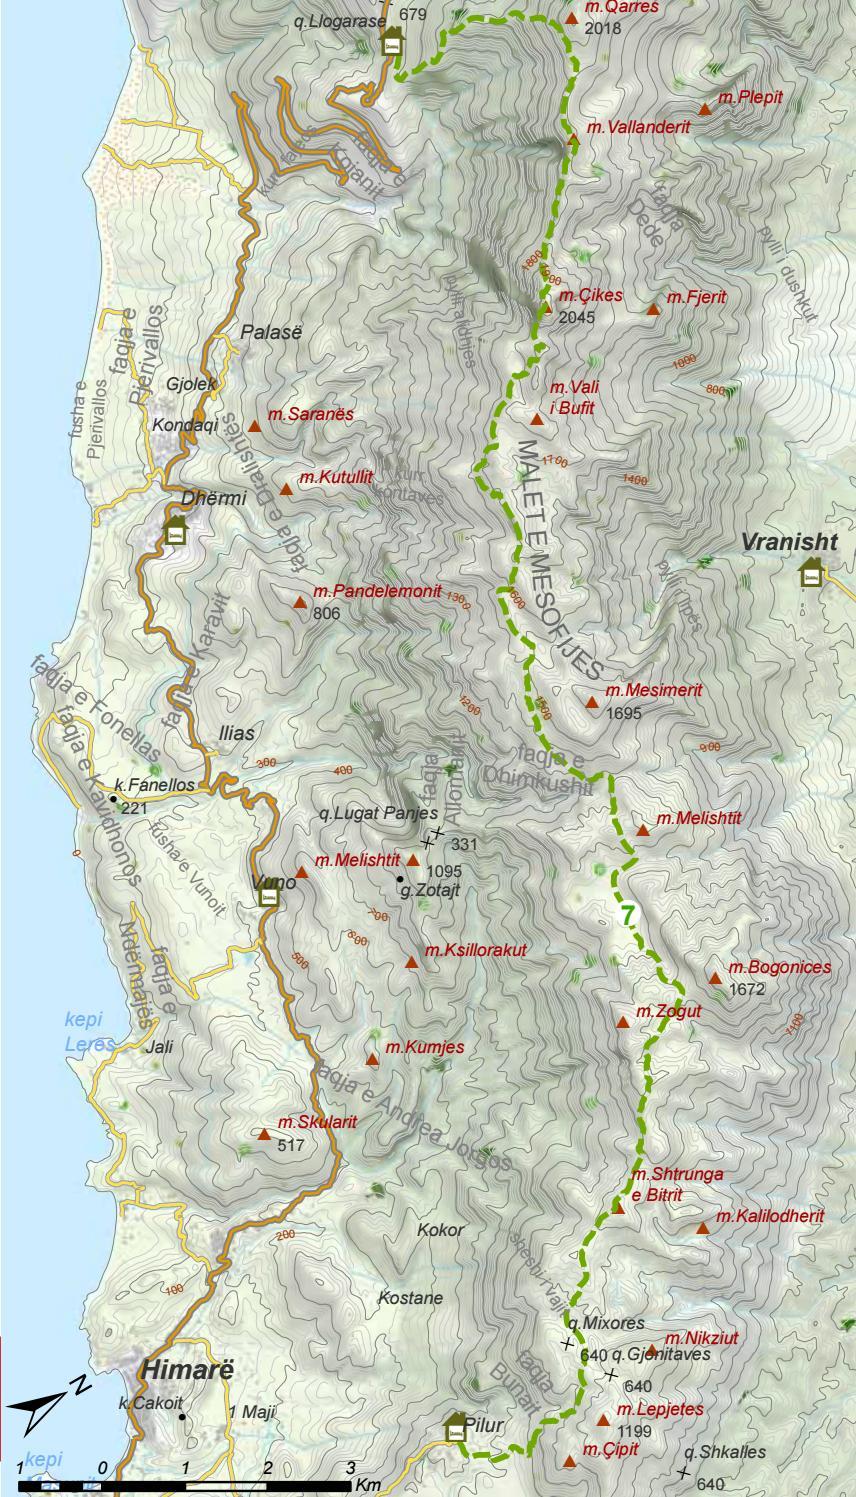 Hiking Trails in Himara Region page 53